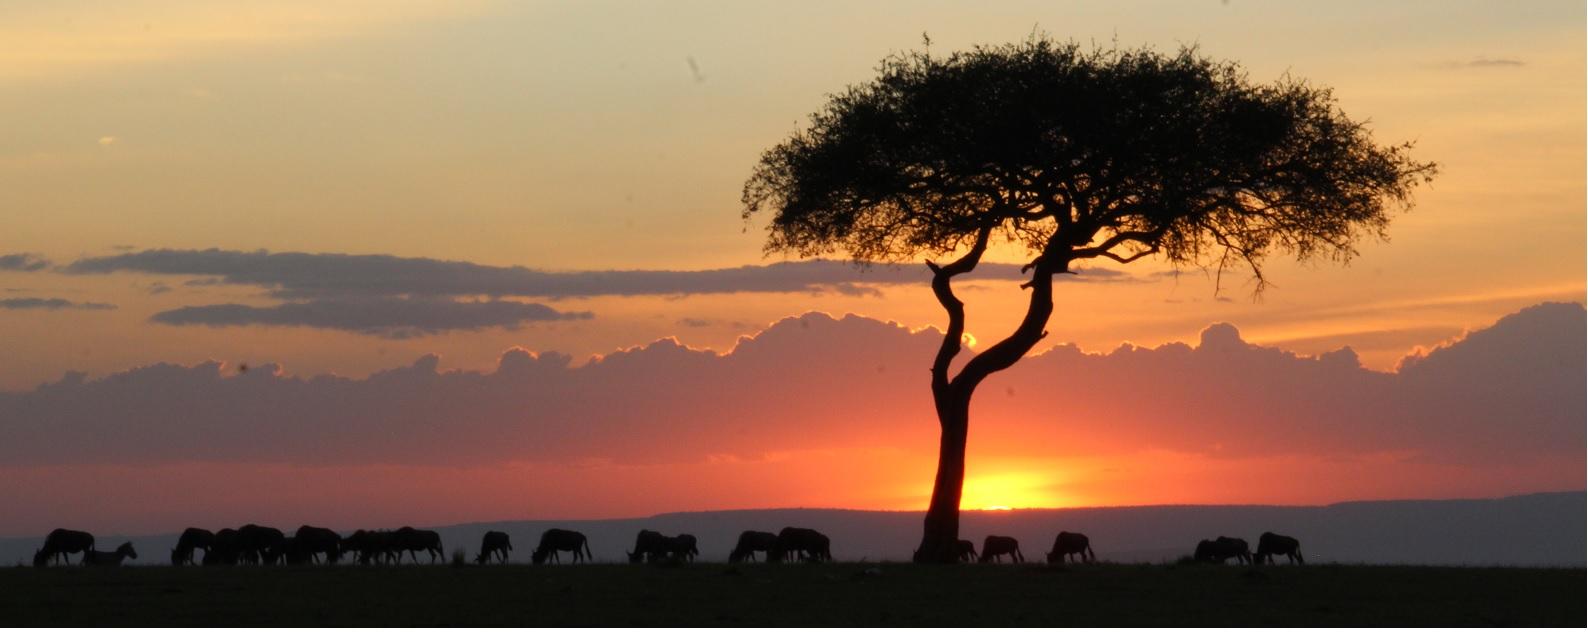 Safari en Kenia guia